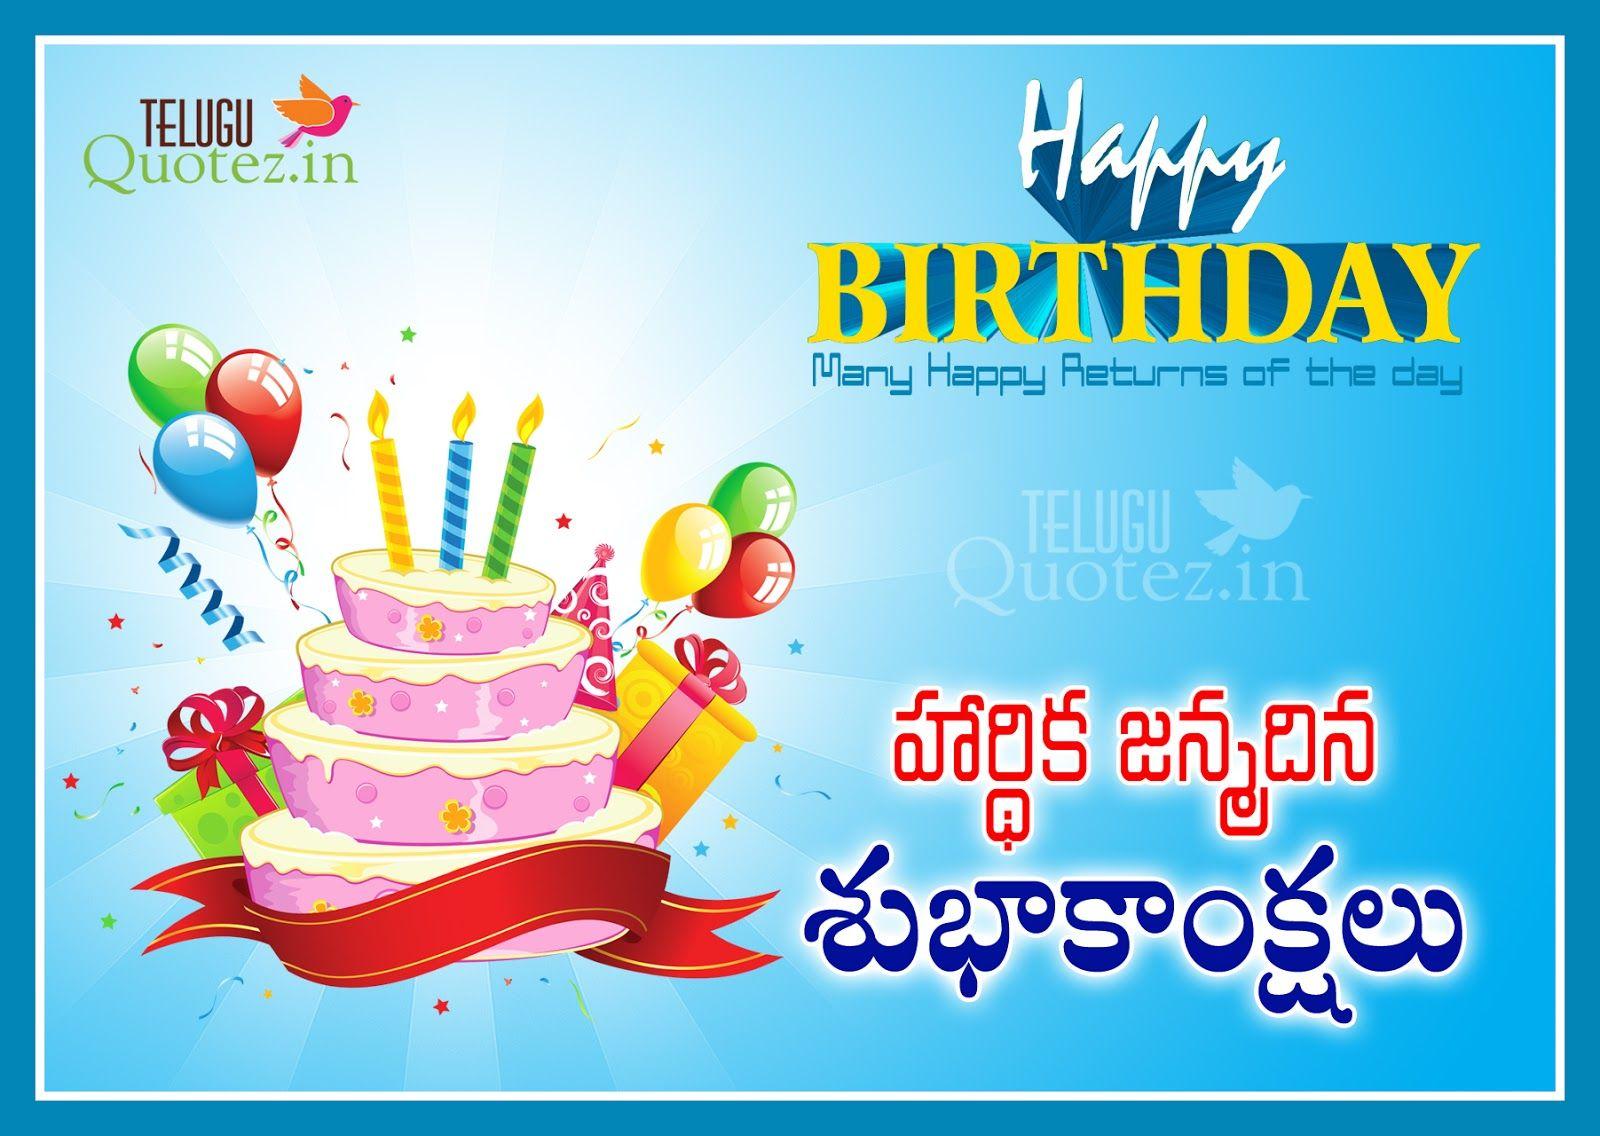 Happy Birthday Telugu Quotes Wishes Teluguquotez In How To Wish Happy Birthday In Telugu